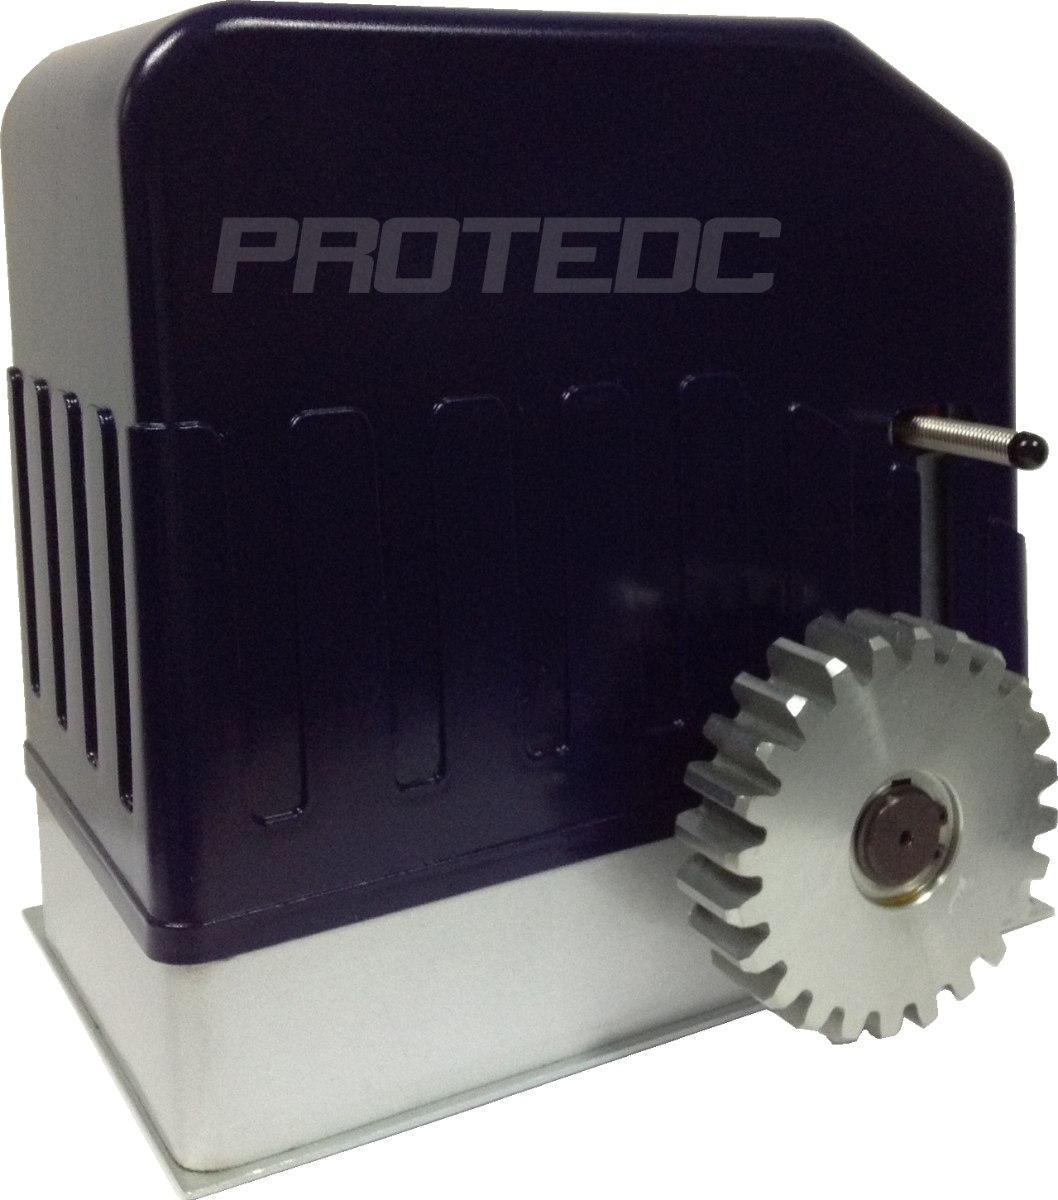 Motor porton electrico pi on galvanizado 800kg bs 39 for Motor porton electrico